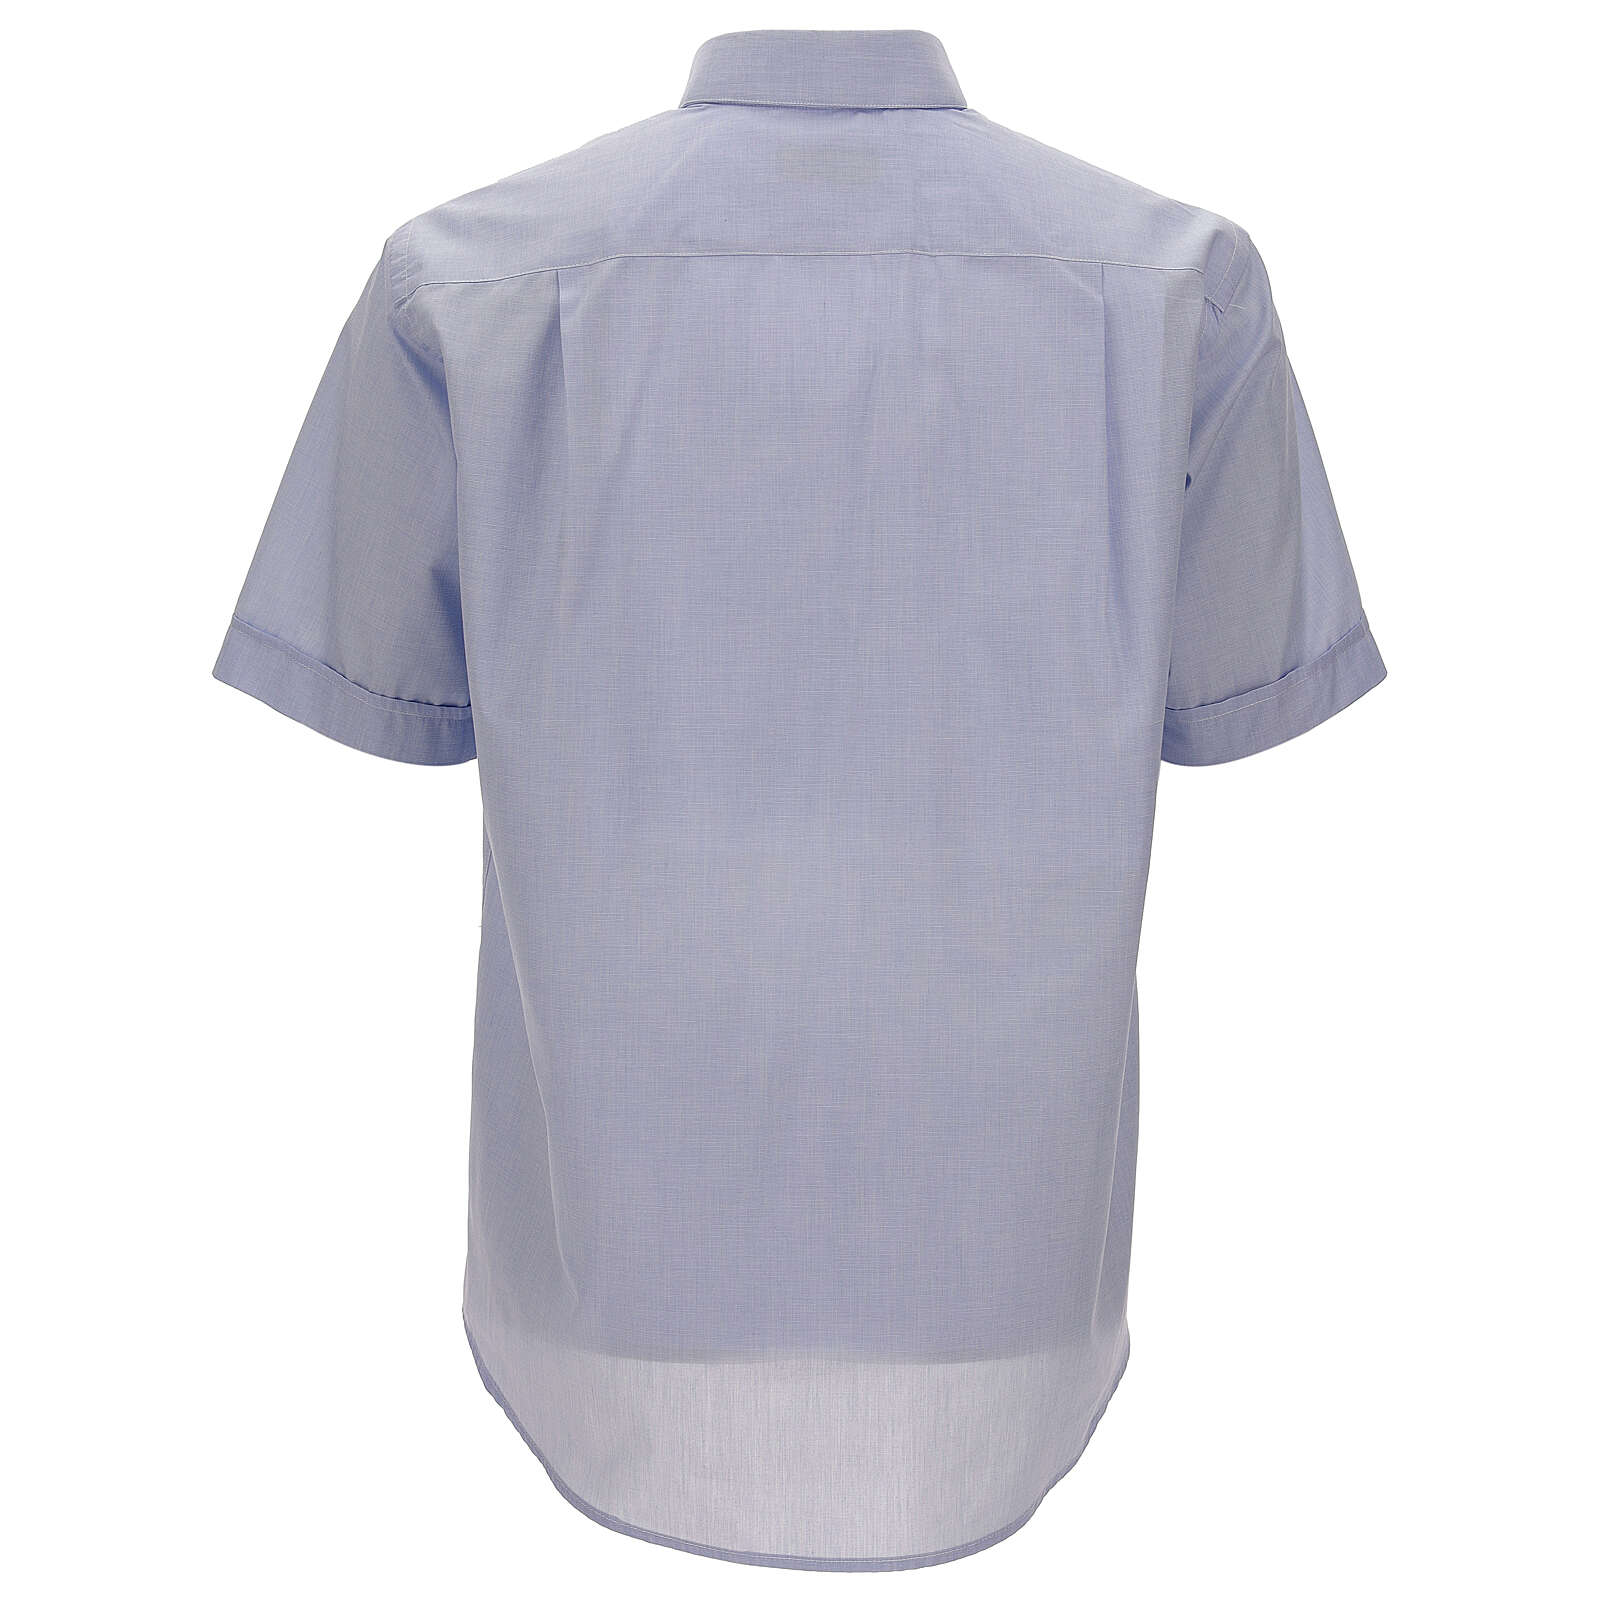 Camisa colarinho clergy azul-celeste filafil manga corta 4